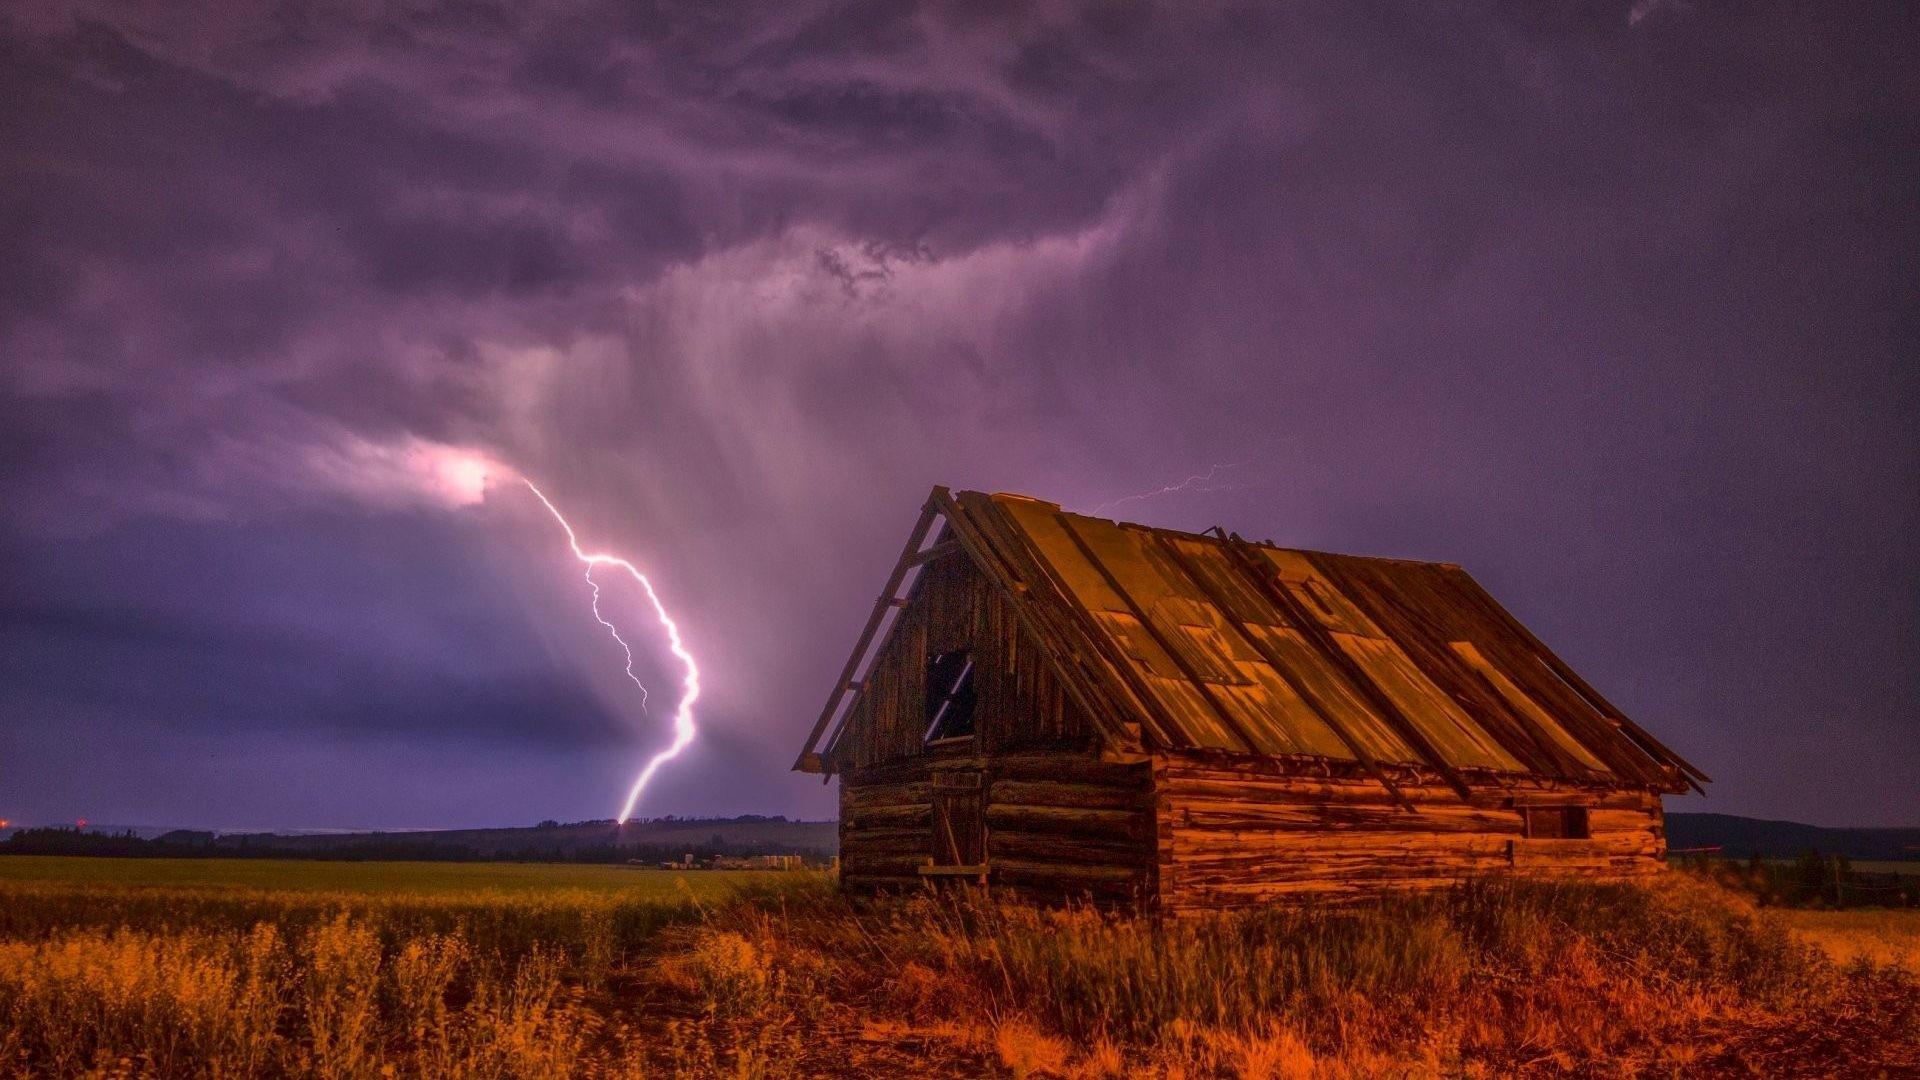 Thunderstorm desktop wallpaper 61 images - Free 1920x1080 desktop wallpaper ...